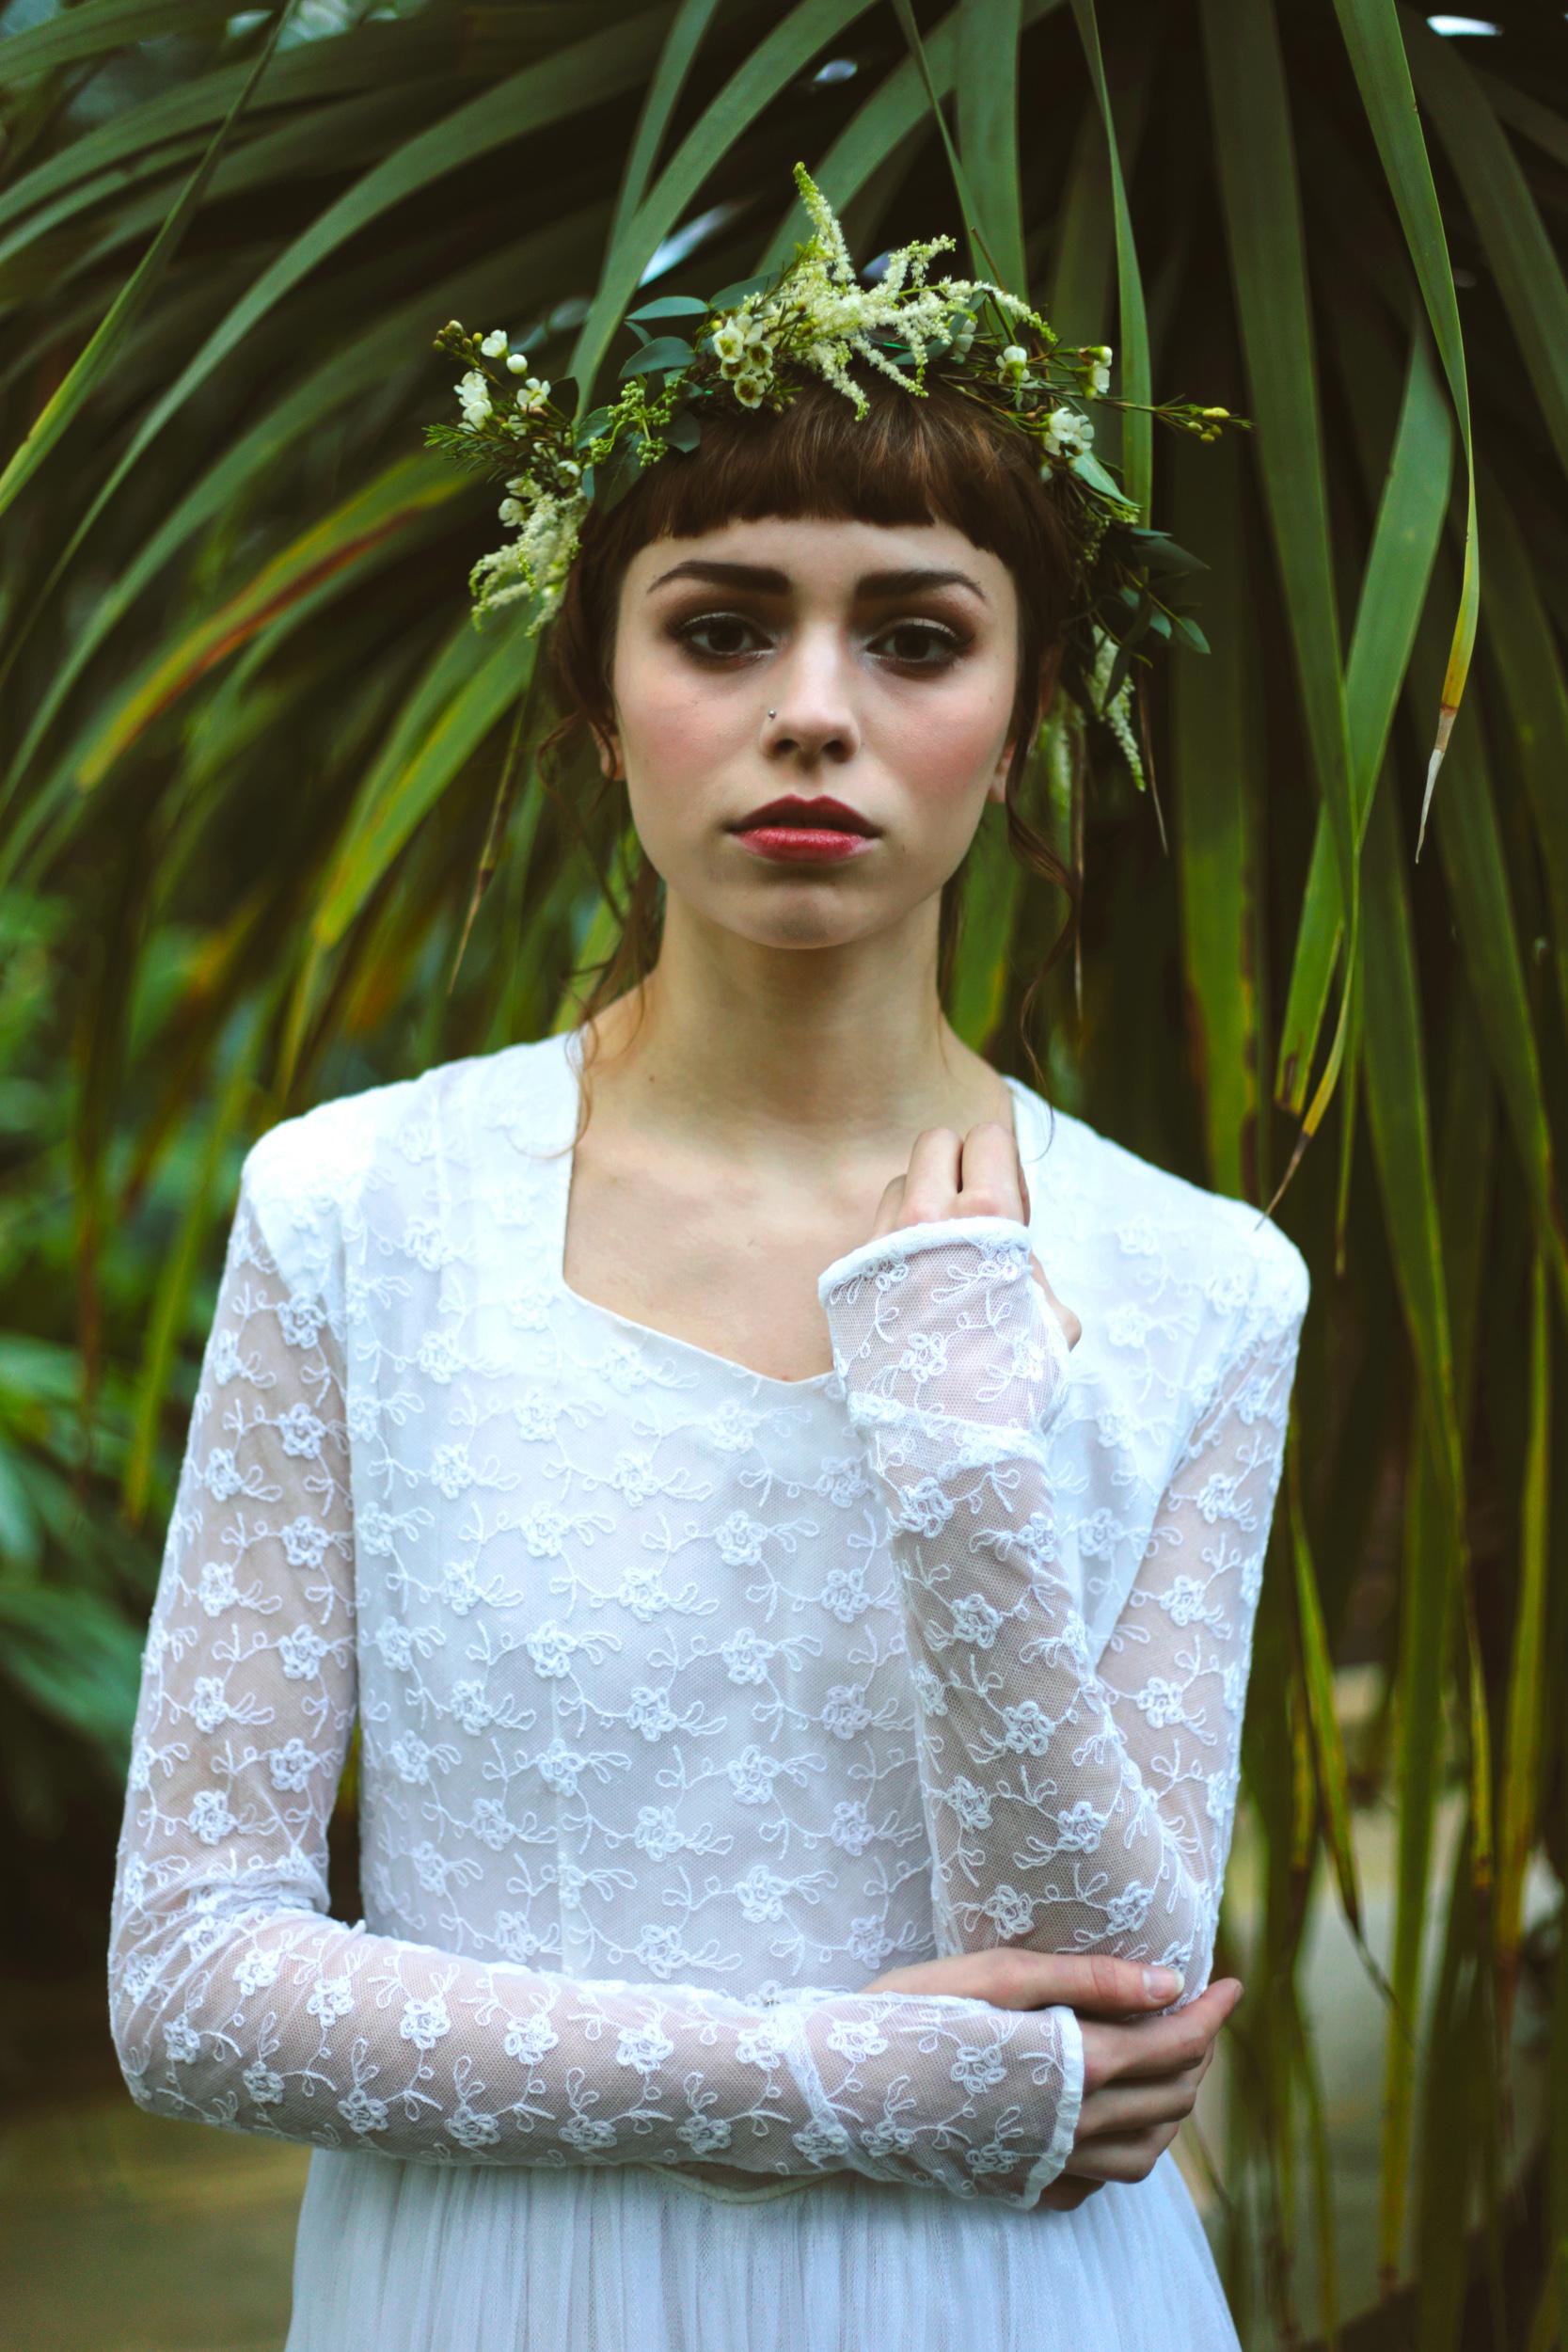 Winter-Bridal-Kate-Beaumont-Shelley-Richmond-Vintage-Wedding-Dress-26.jpg